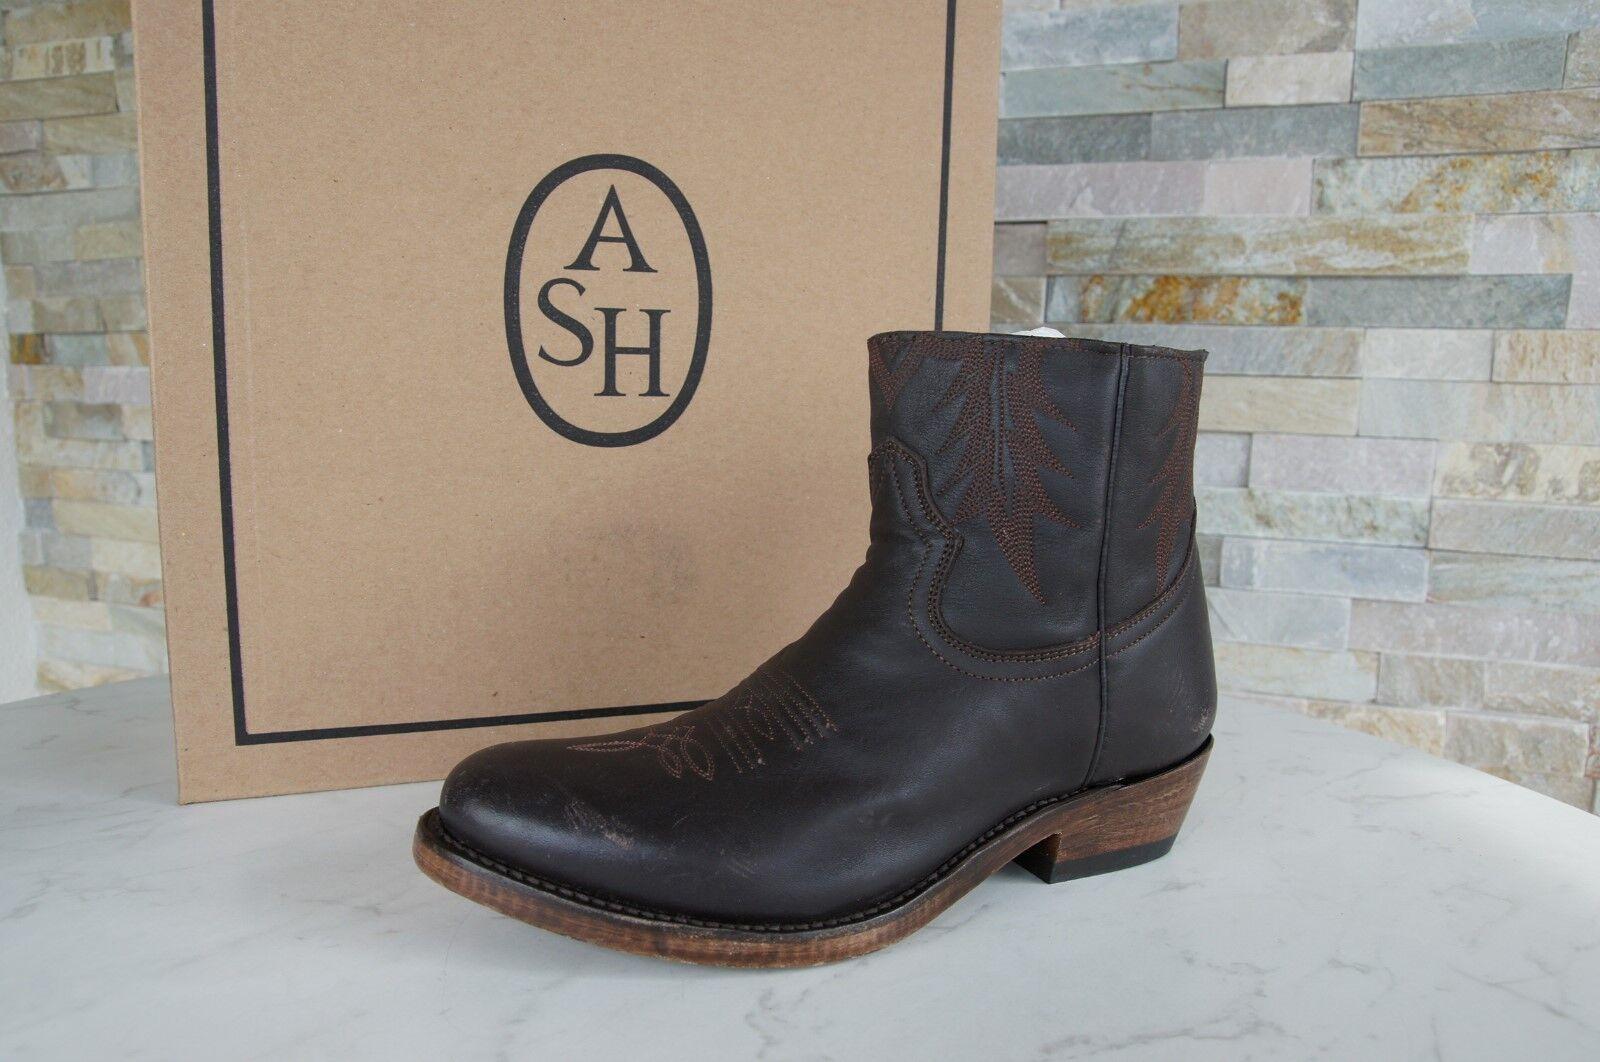 be5b969fa4a 38,5 botaies zapatos botines vintage country kut marrón ex PVP Ash nuevo  otahcx1148-Botas